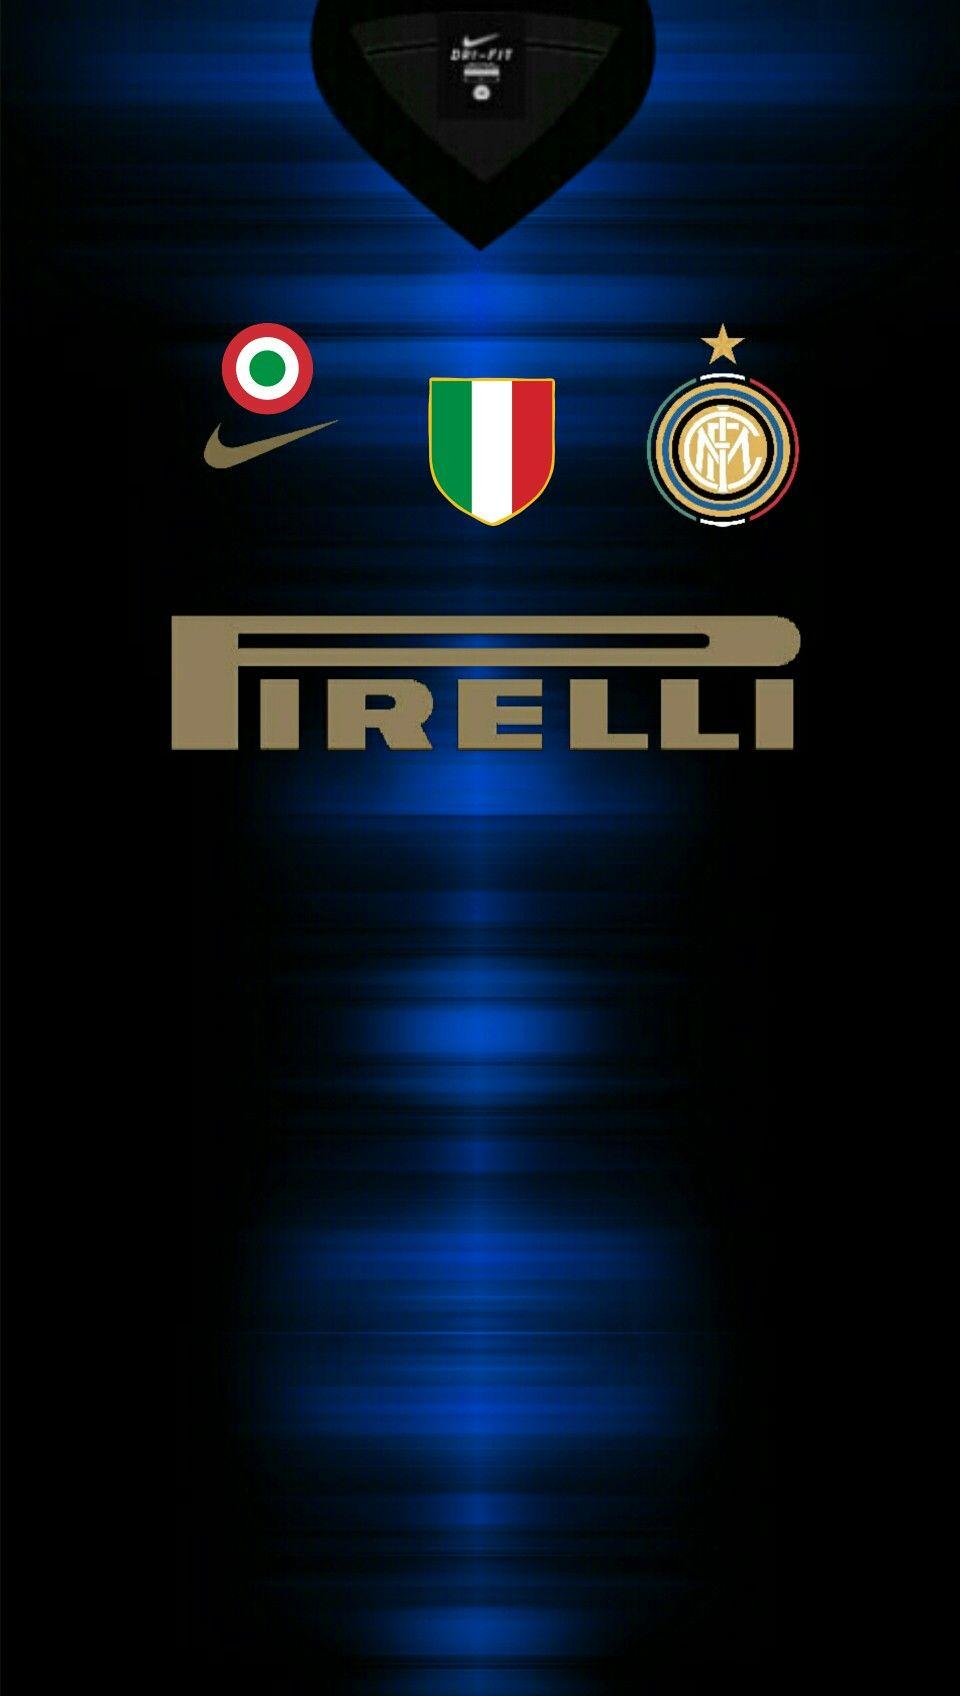 Jersey Inter Milan 2018 960x1696 Download Hd Wallpaper Wallpapertip